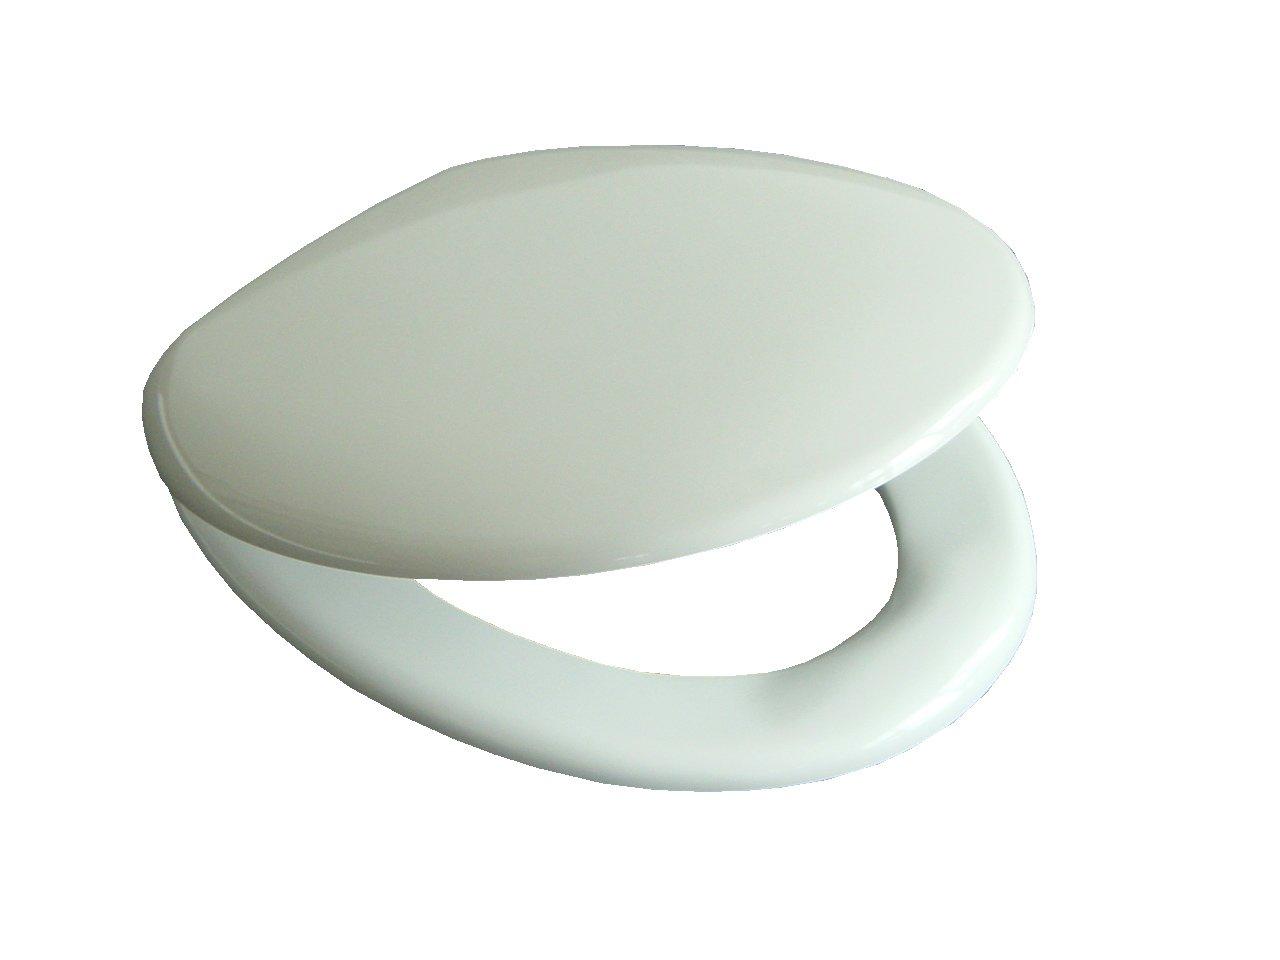 Terrific Amazon Com Adob Verona Wc Sitz Weiss 11502 Home Kitchen Uwap Interior Chair Design Uwaporg